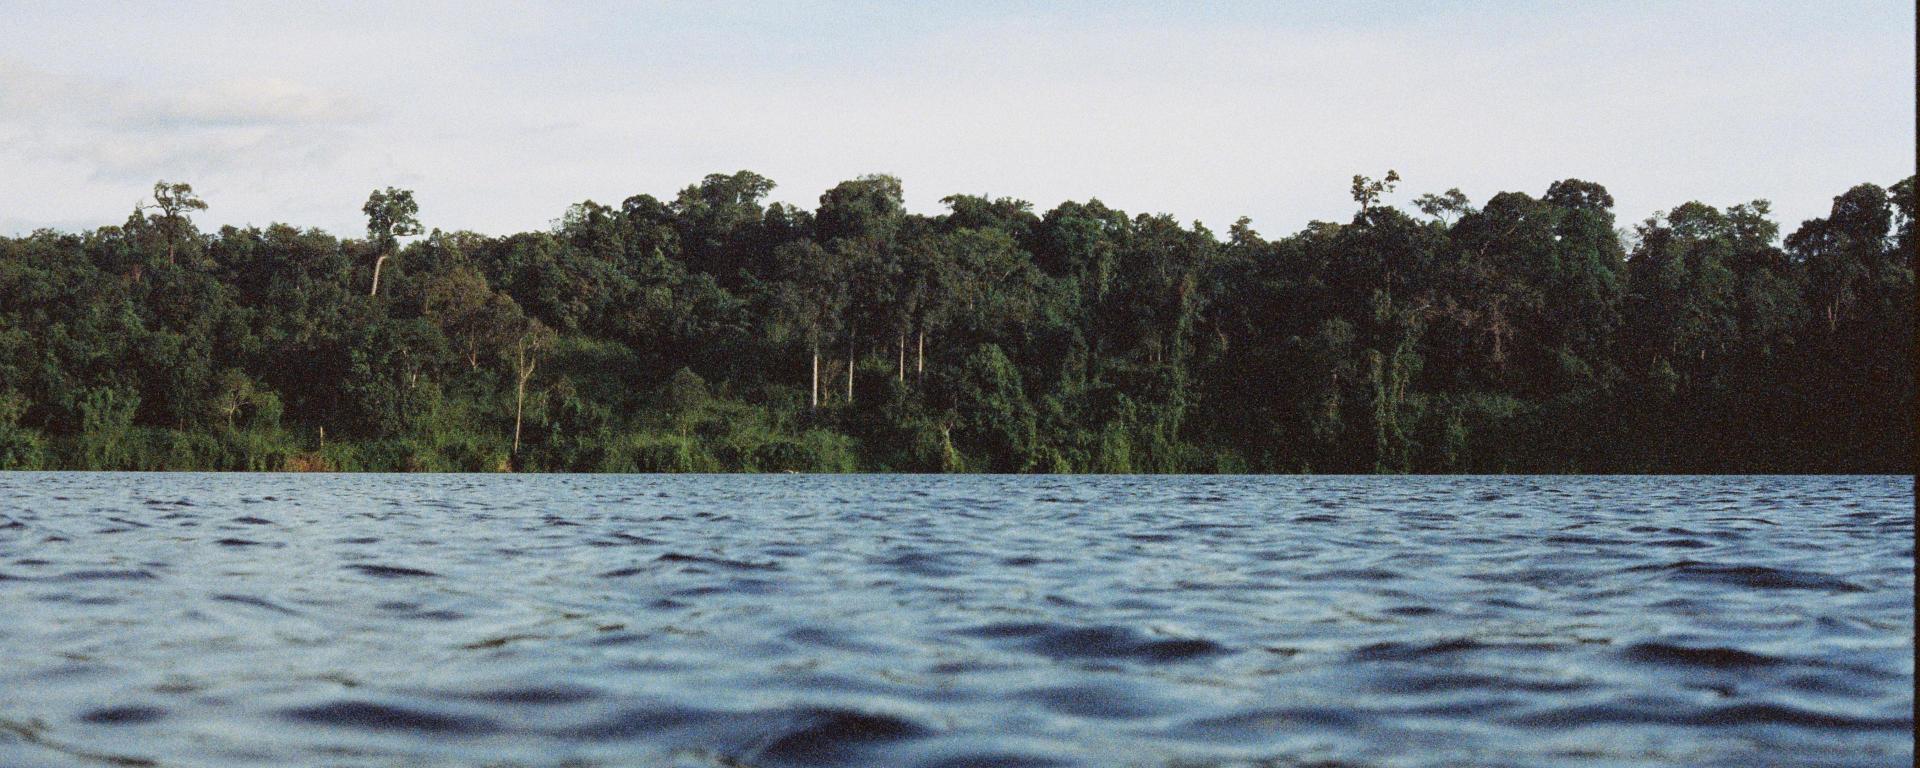 lac yeak laom banlung ratanakiri cambodge